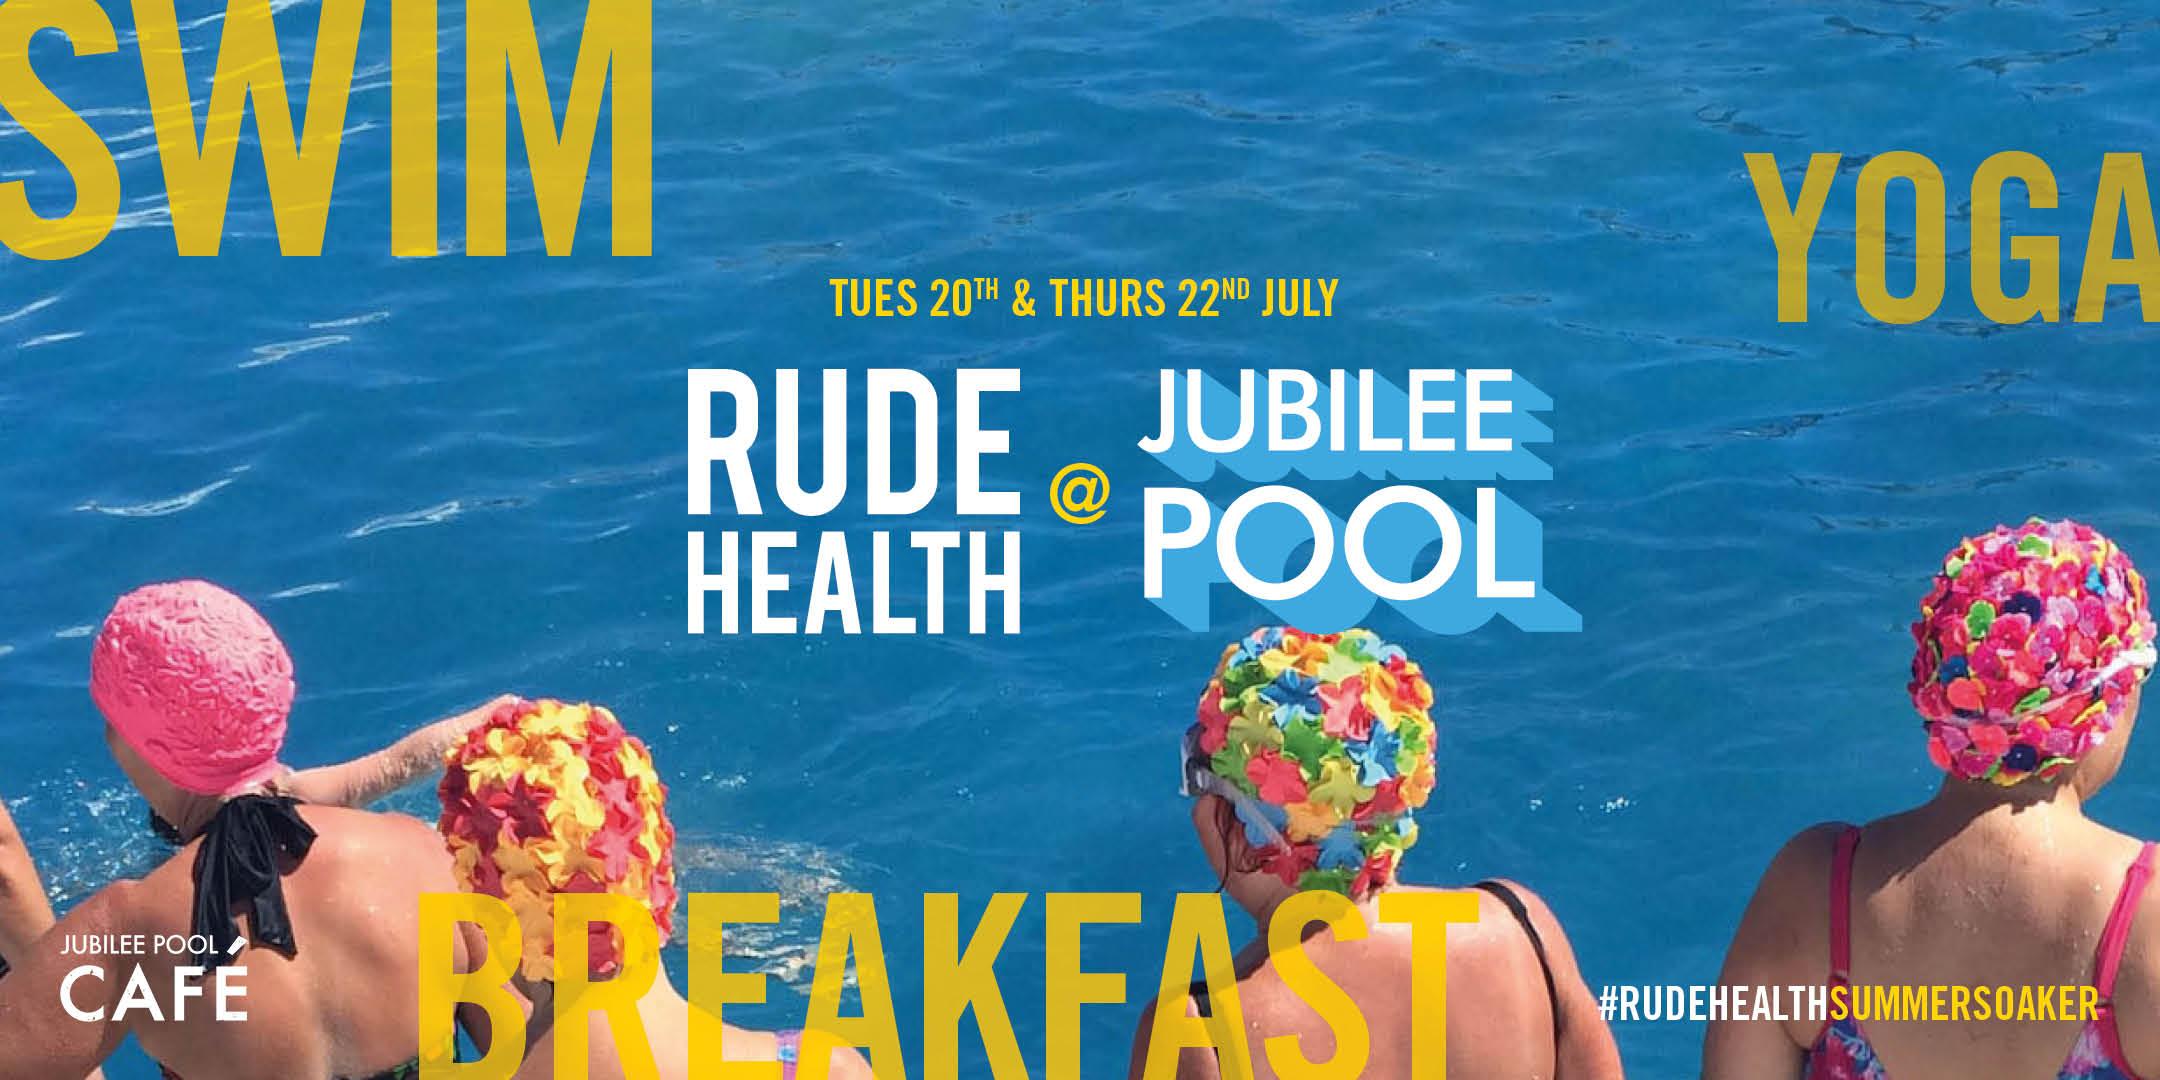 Rude Health's Summer Soaker